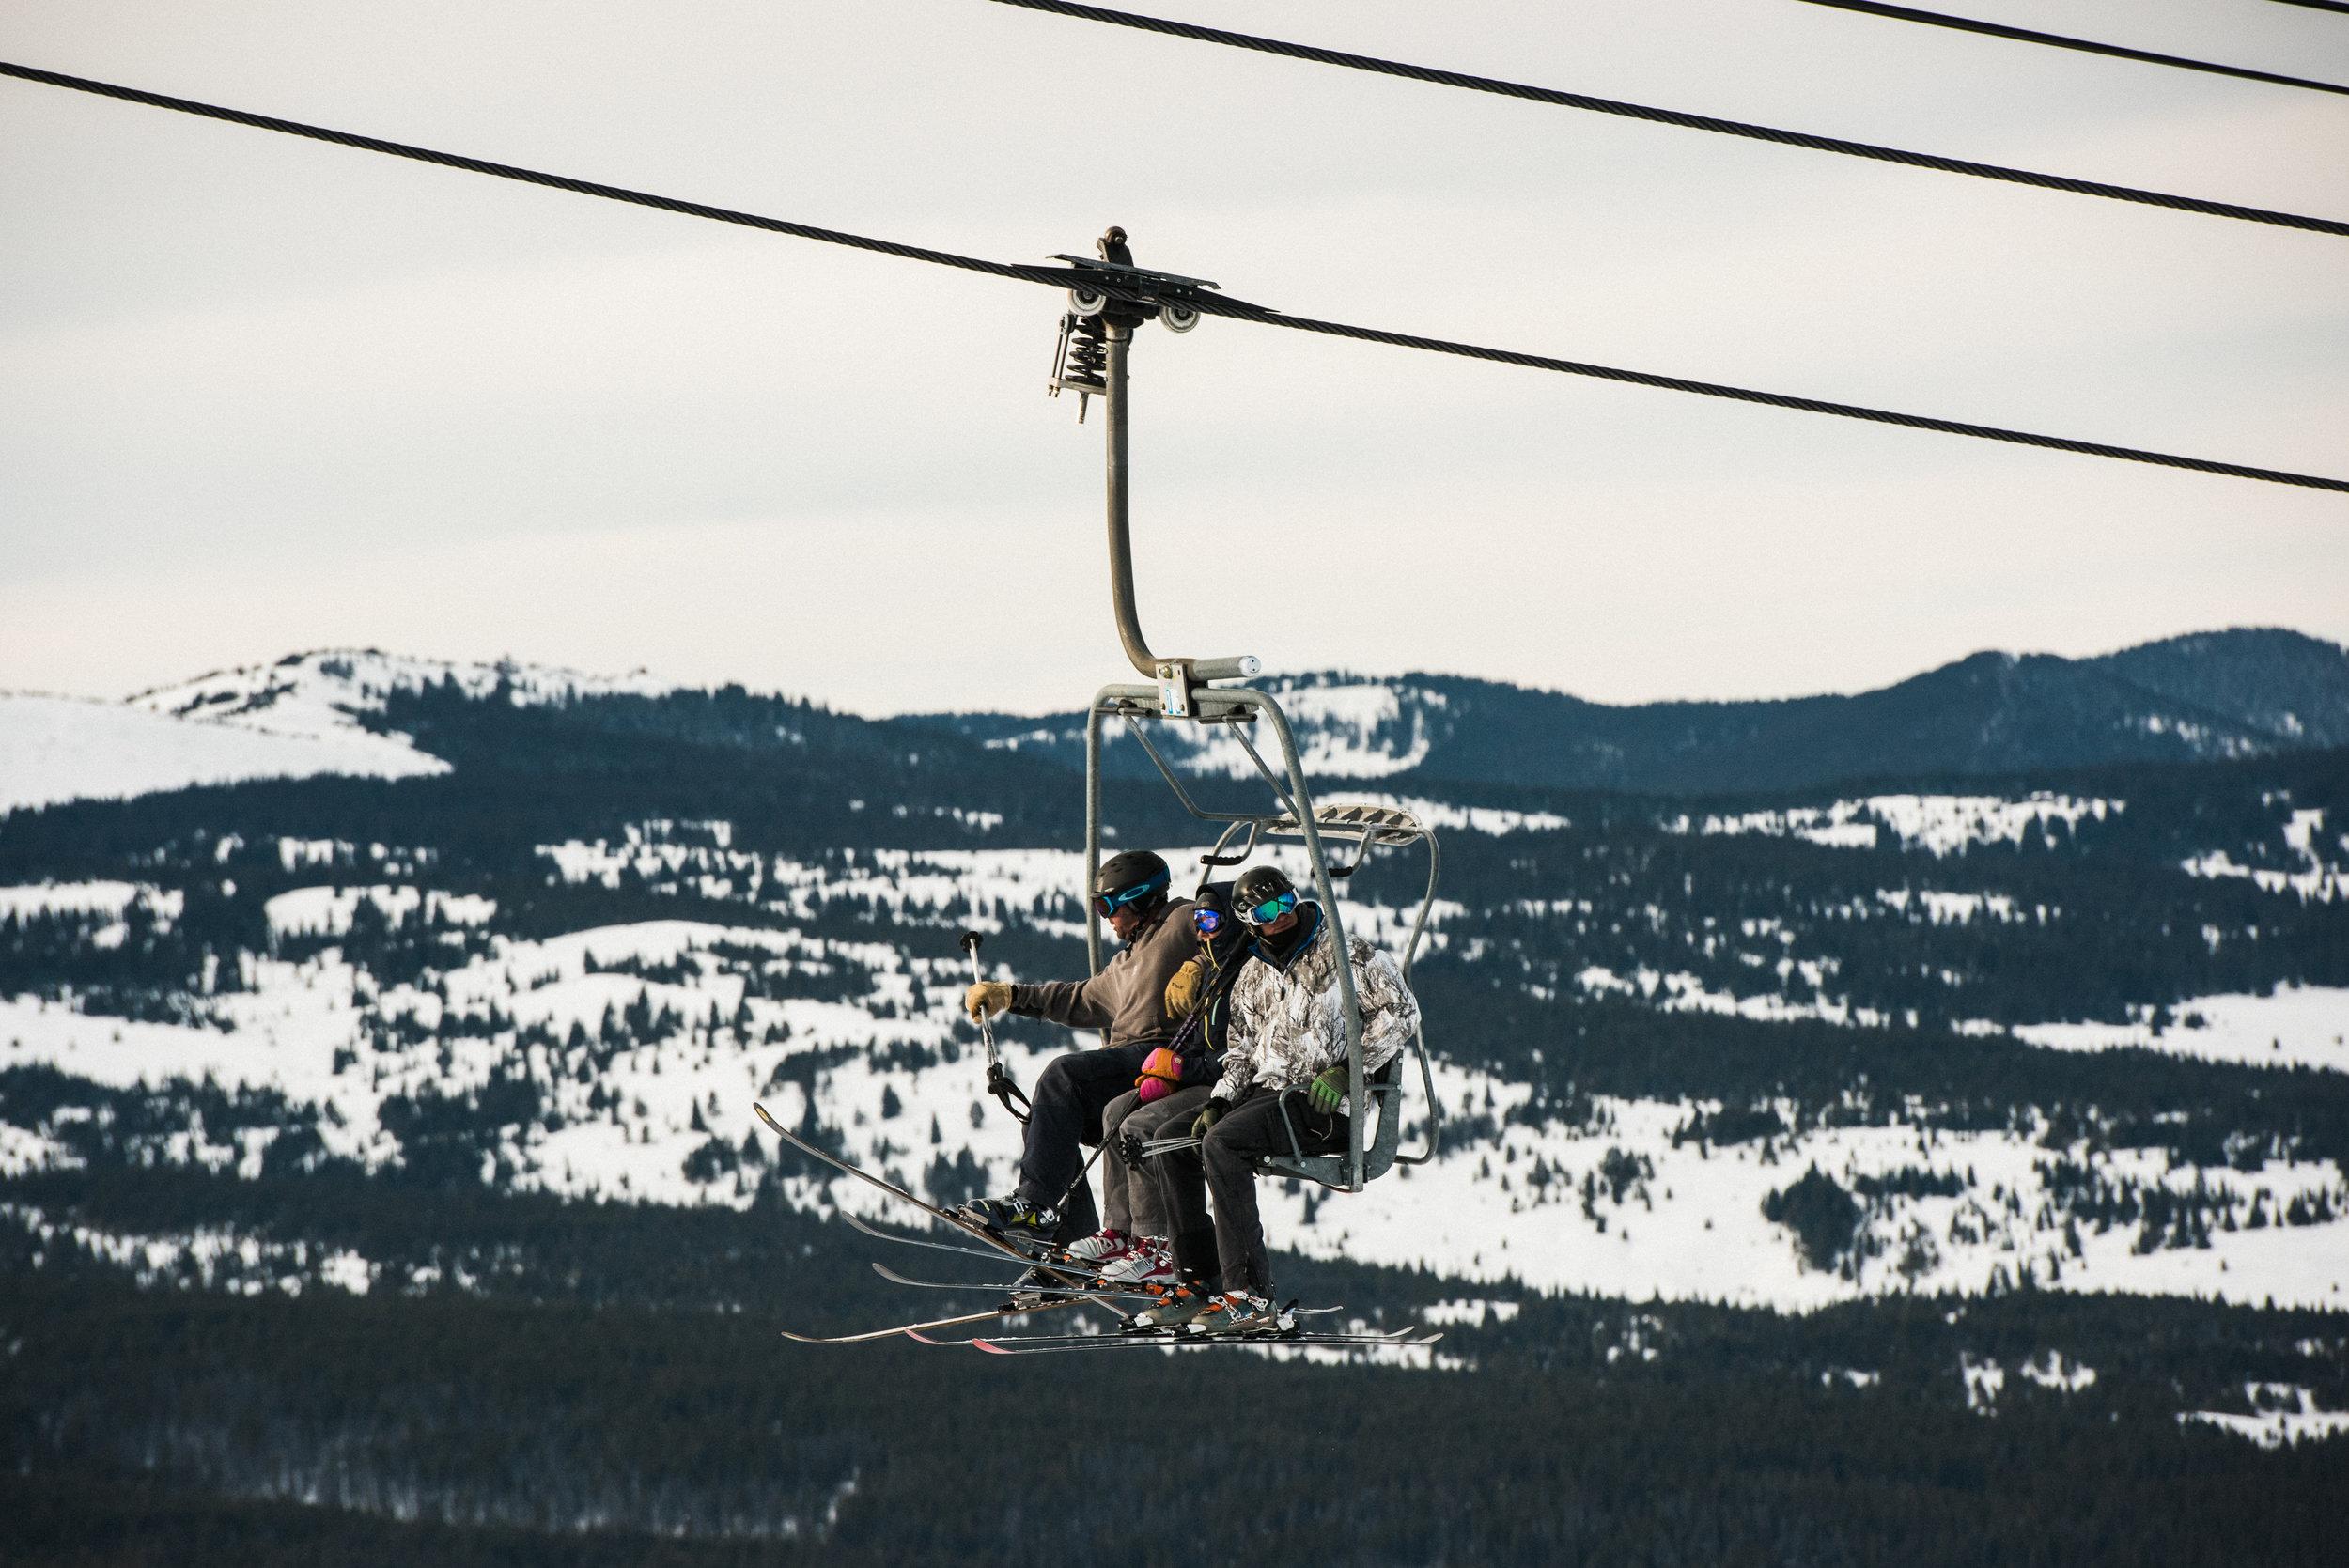 TaraShupe_Outdoor_Photographer_Loweprobags_Colorado_Copper_Mountains_Ski_65.jpg